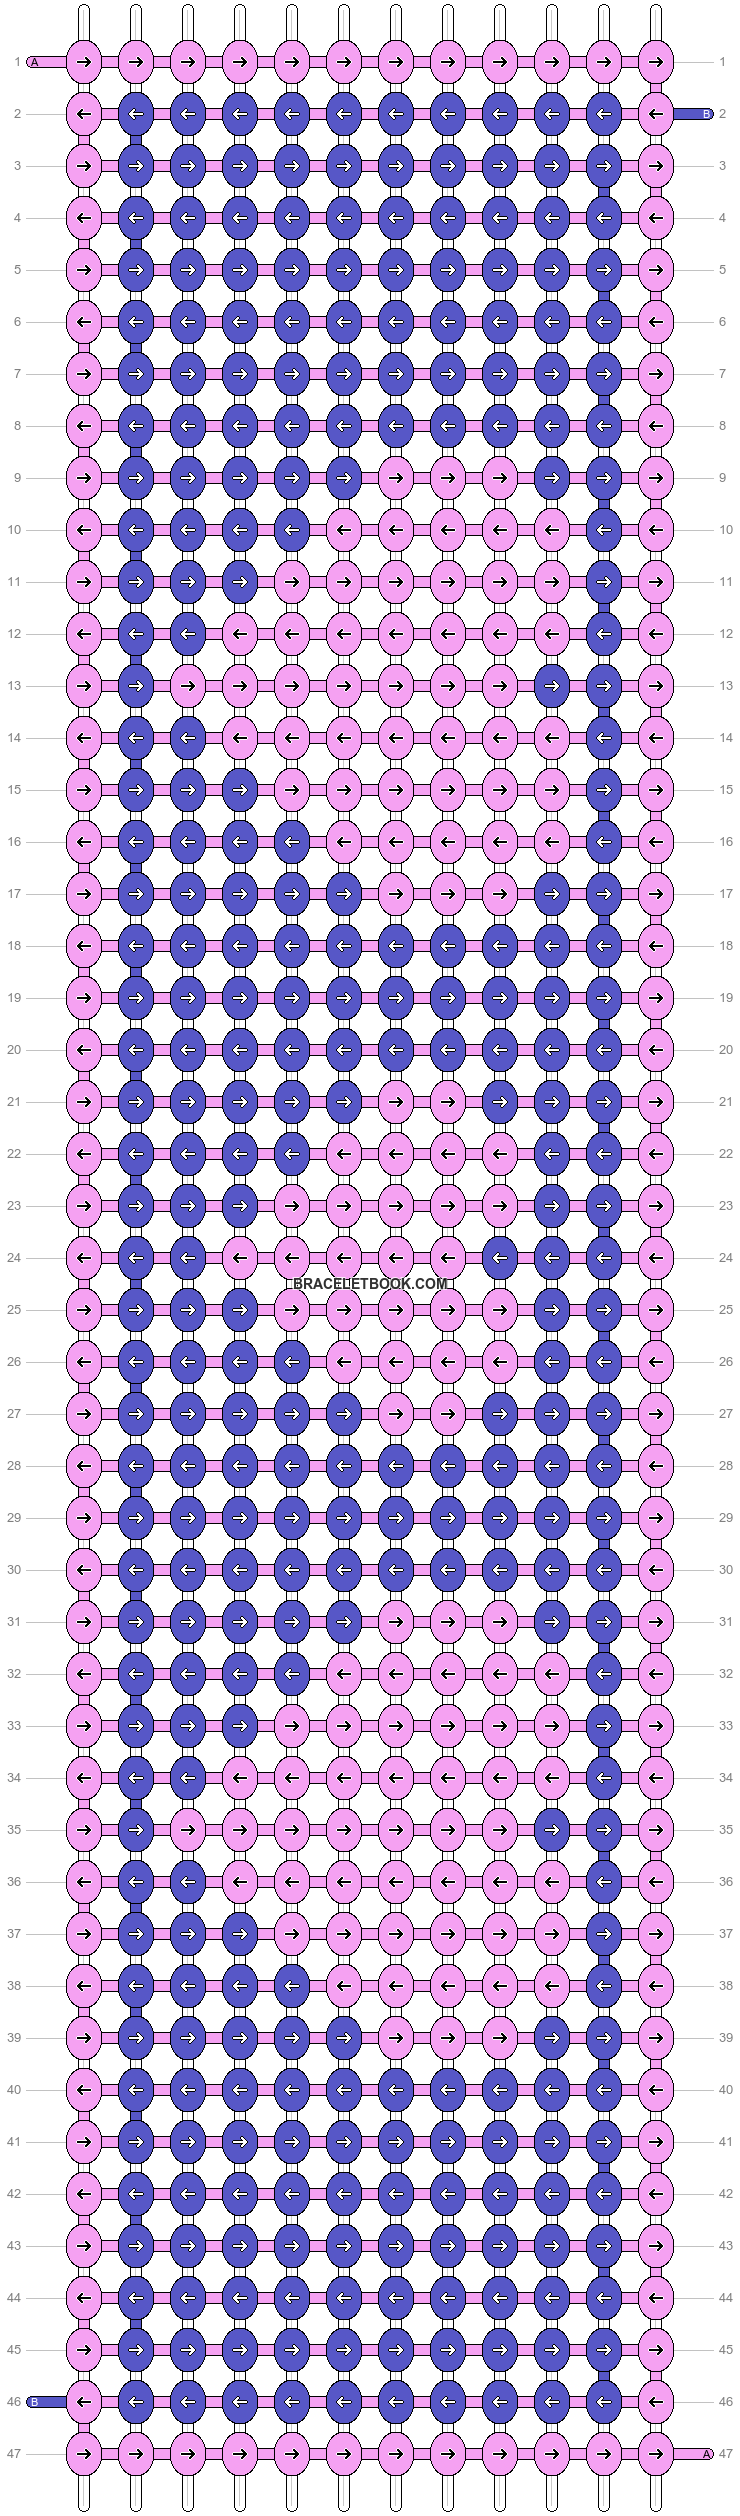 Alpha pattern #12686 pattern